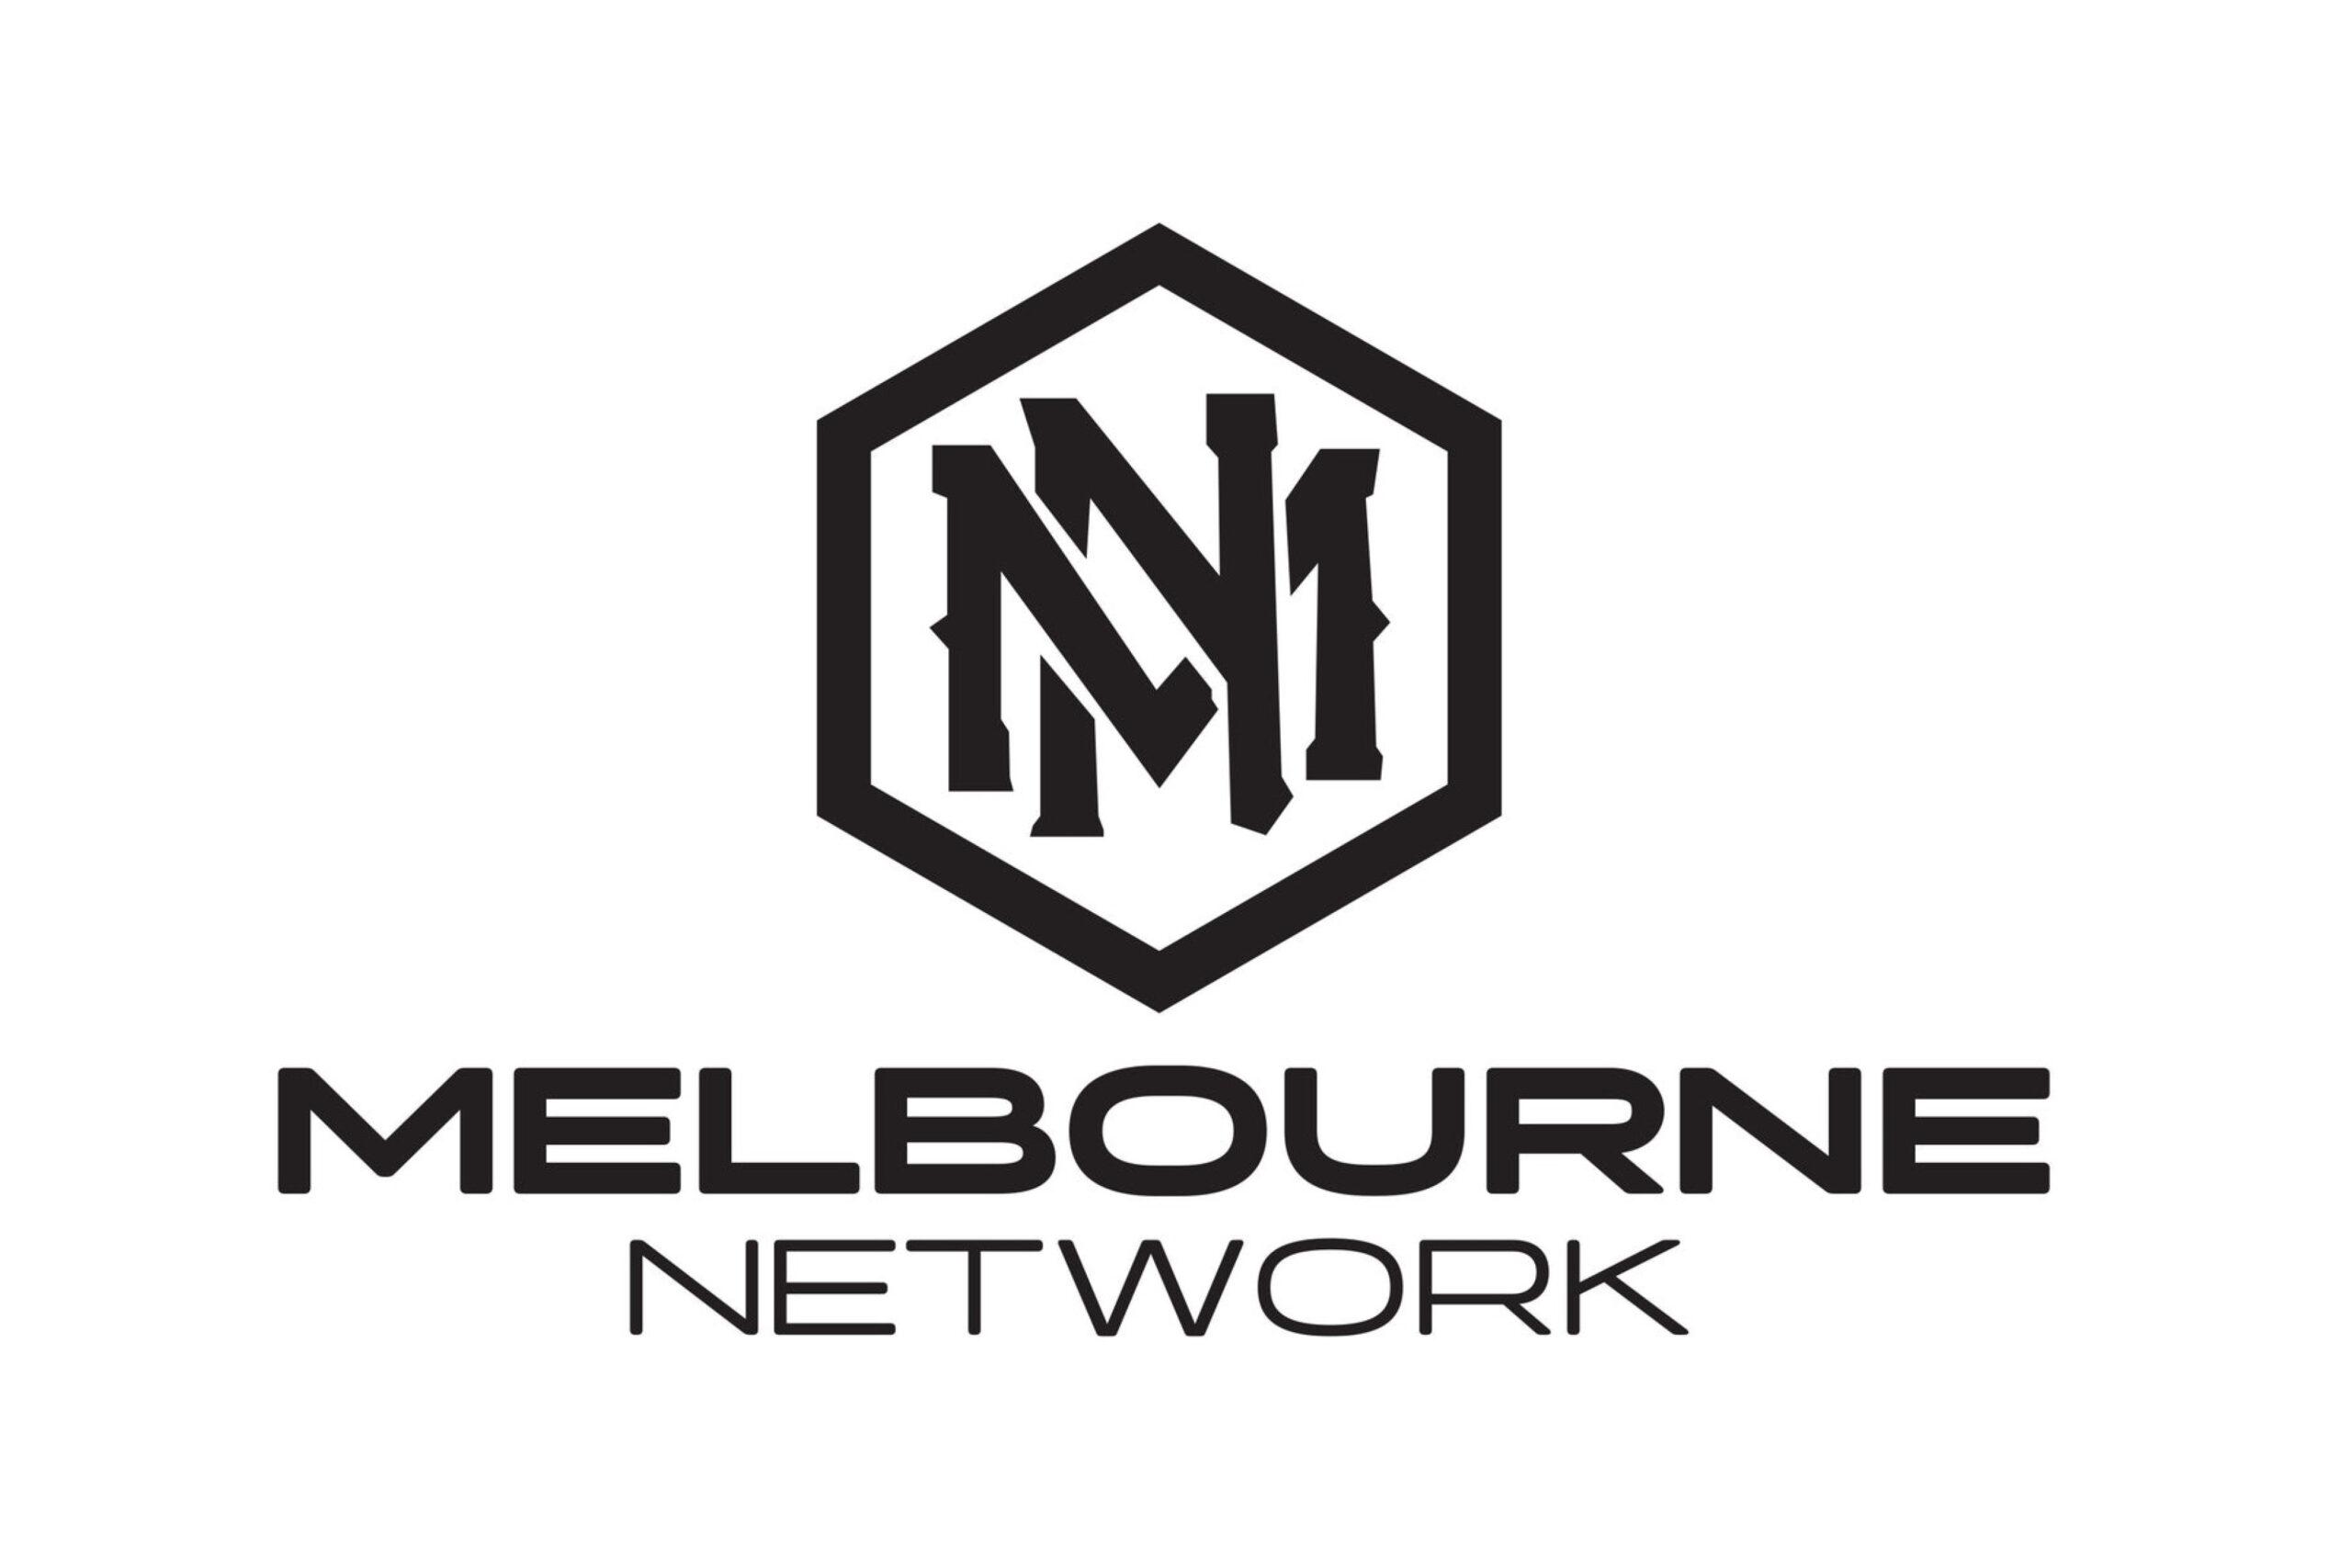 Melbourne Network